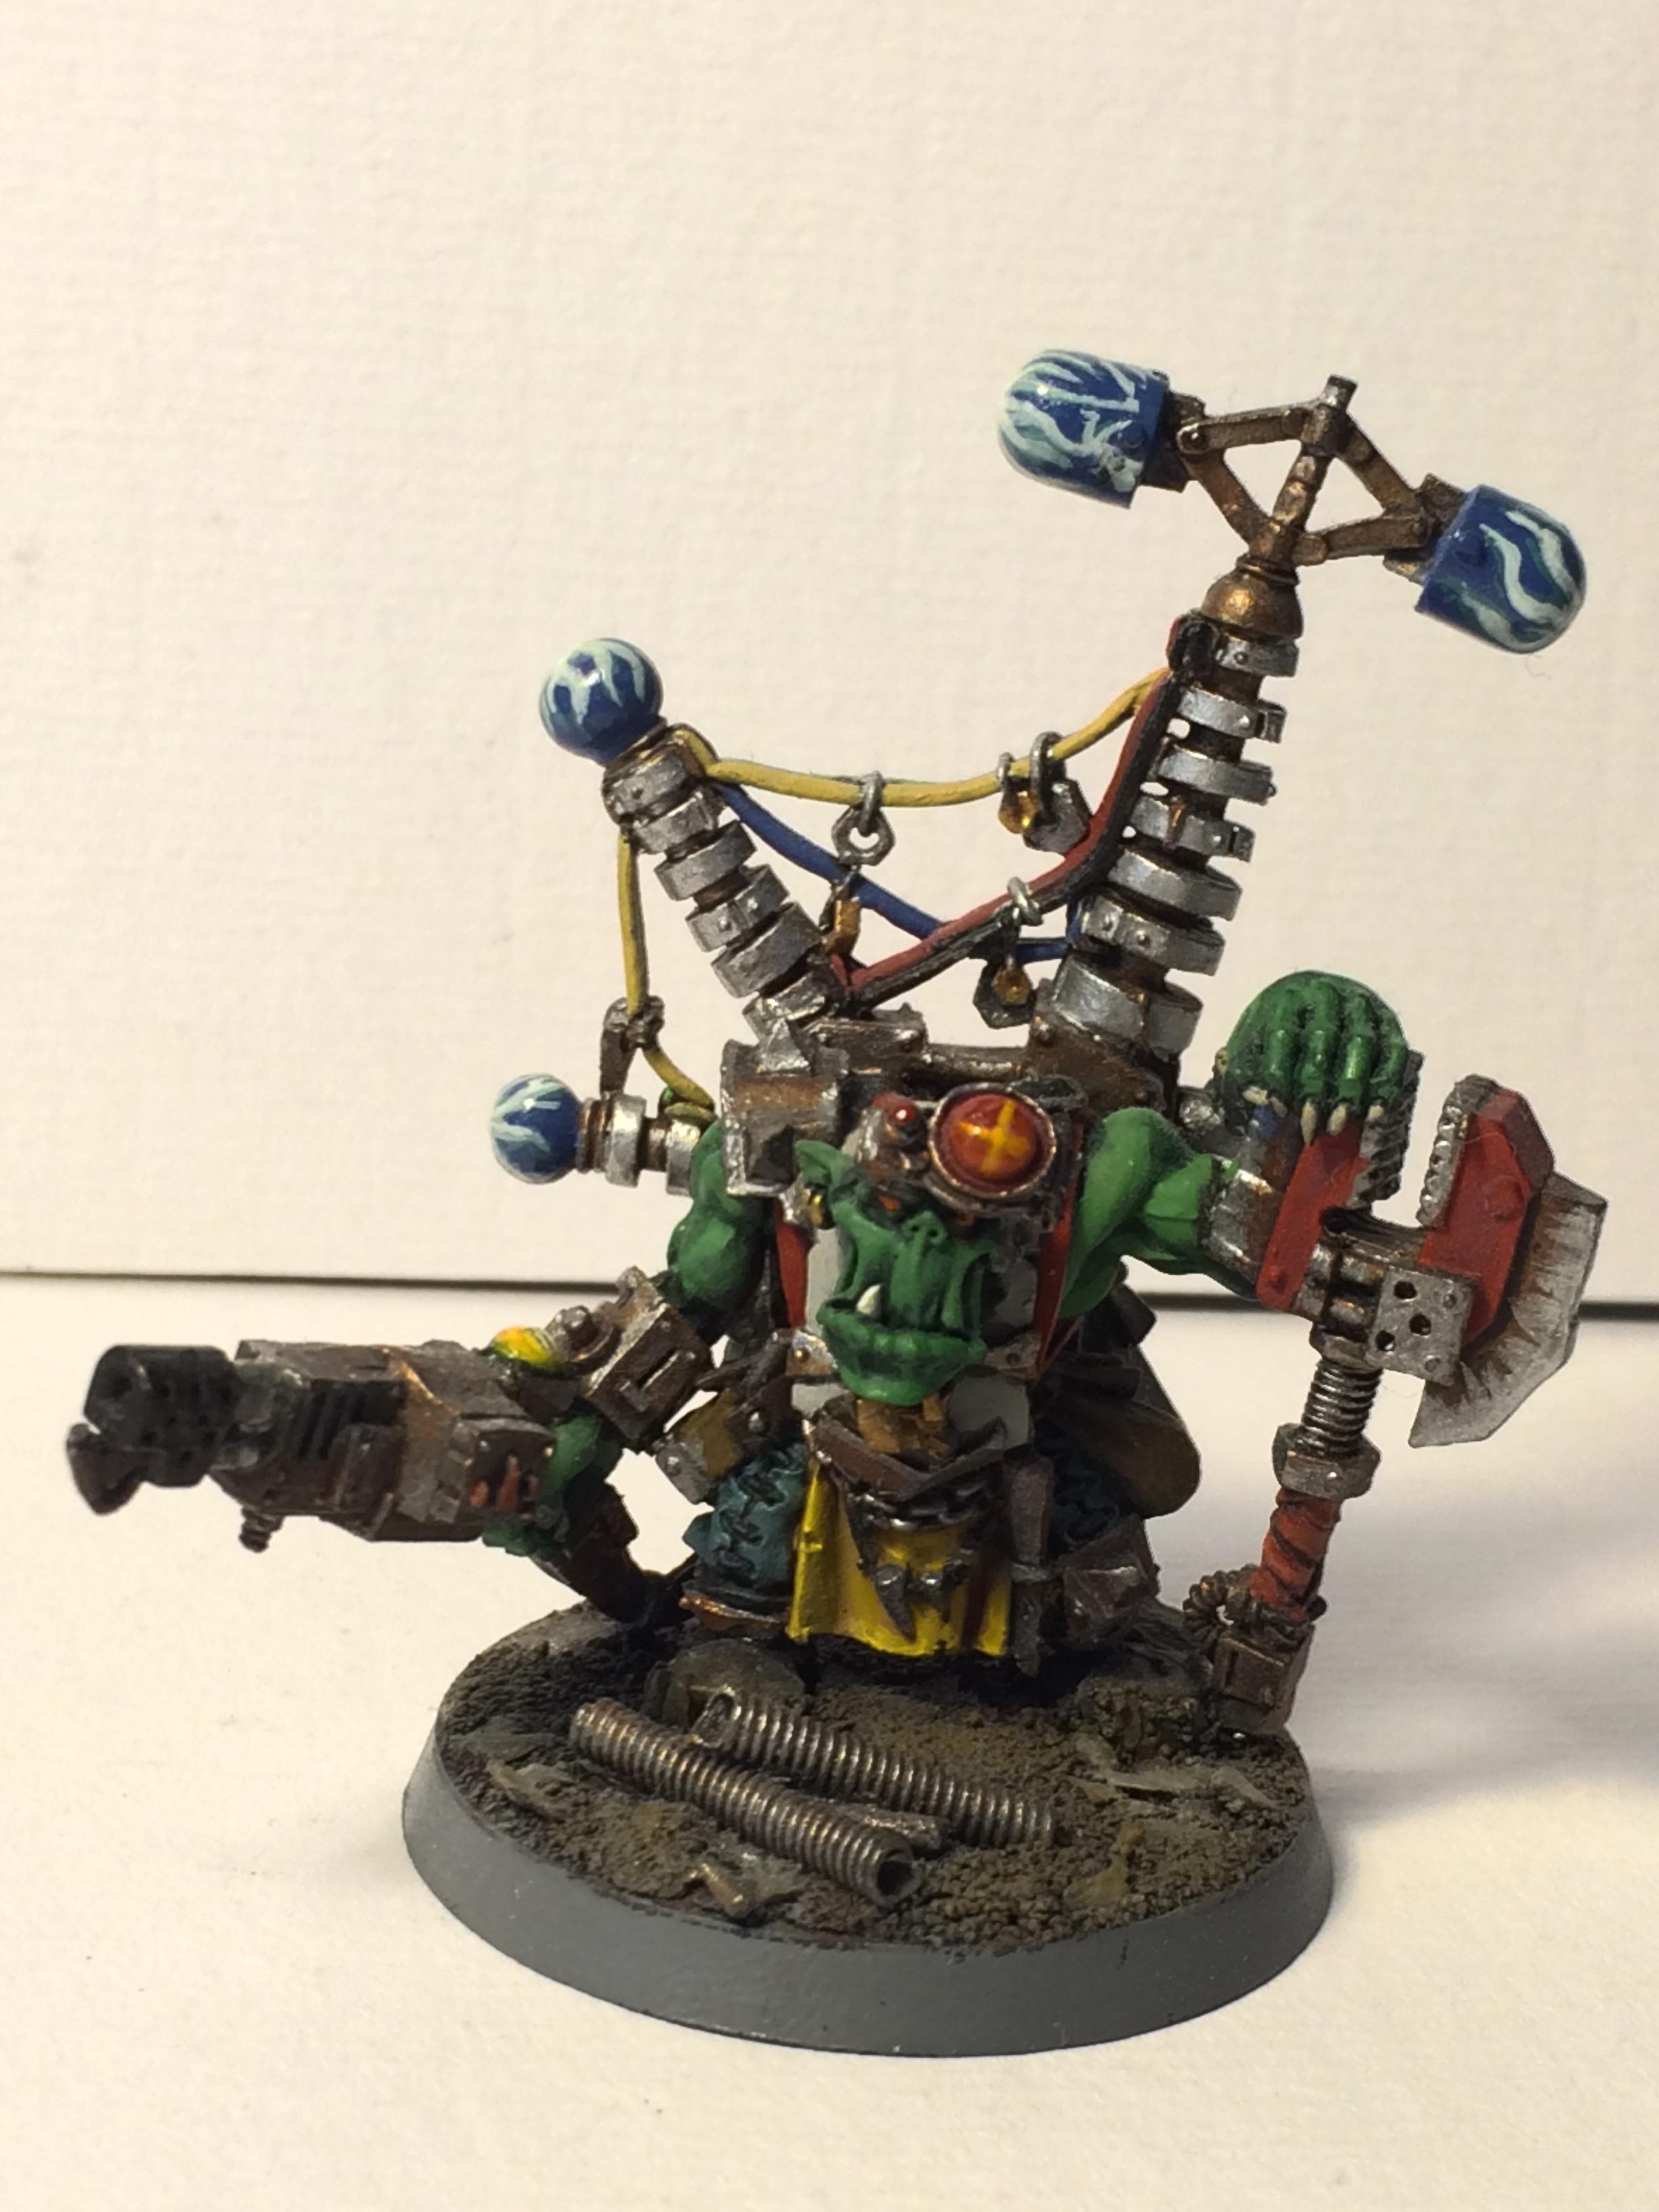 Commission, Gold, Gold Tier, Misc, Painting, Warhamer 40, Warhammer 40,000, Warhammer Fantasy